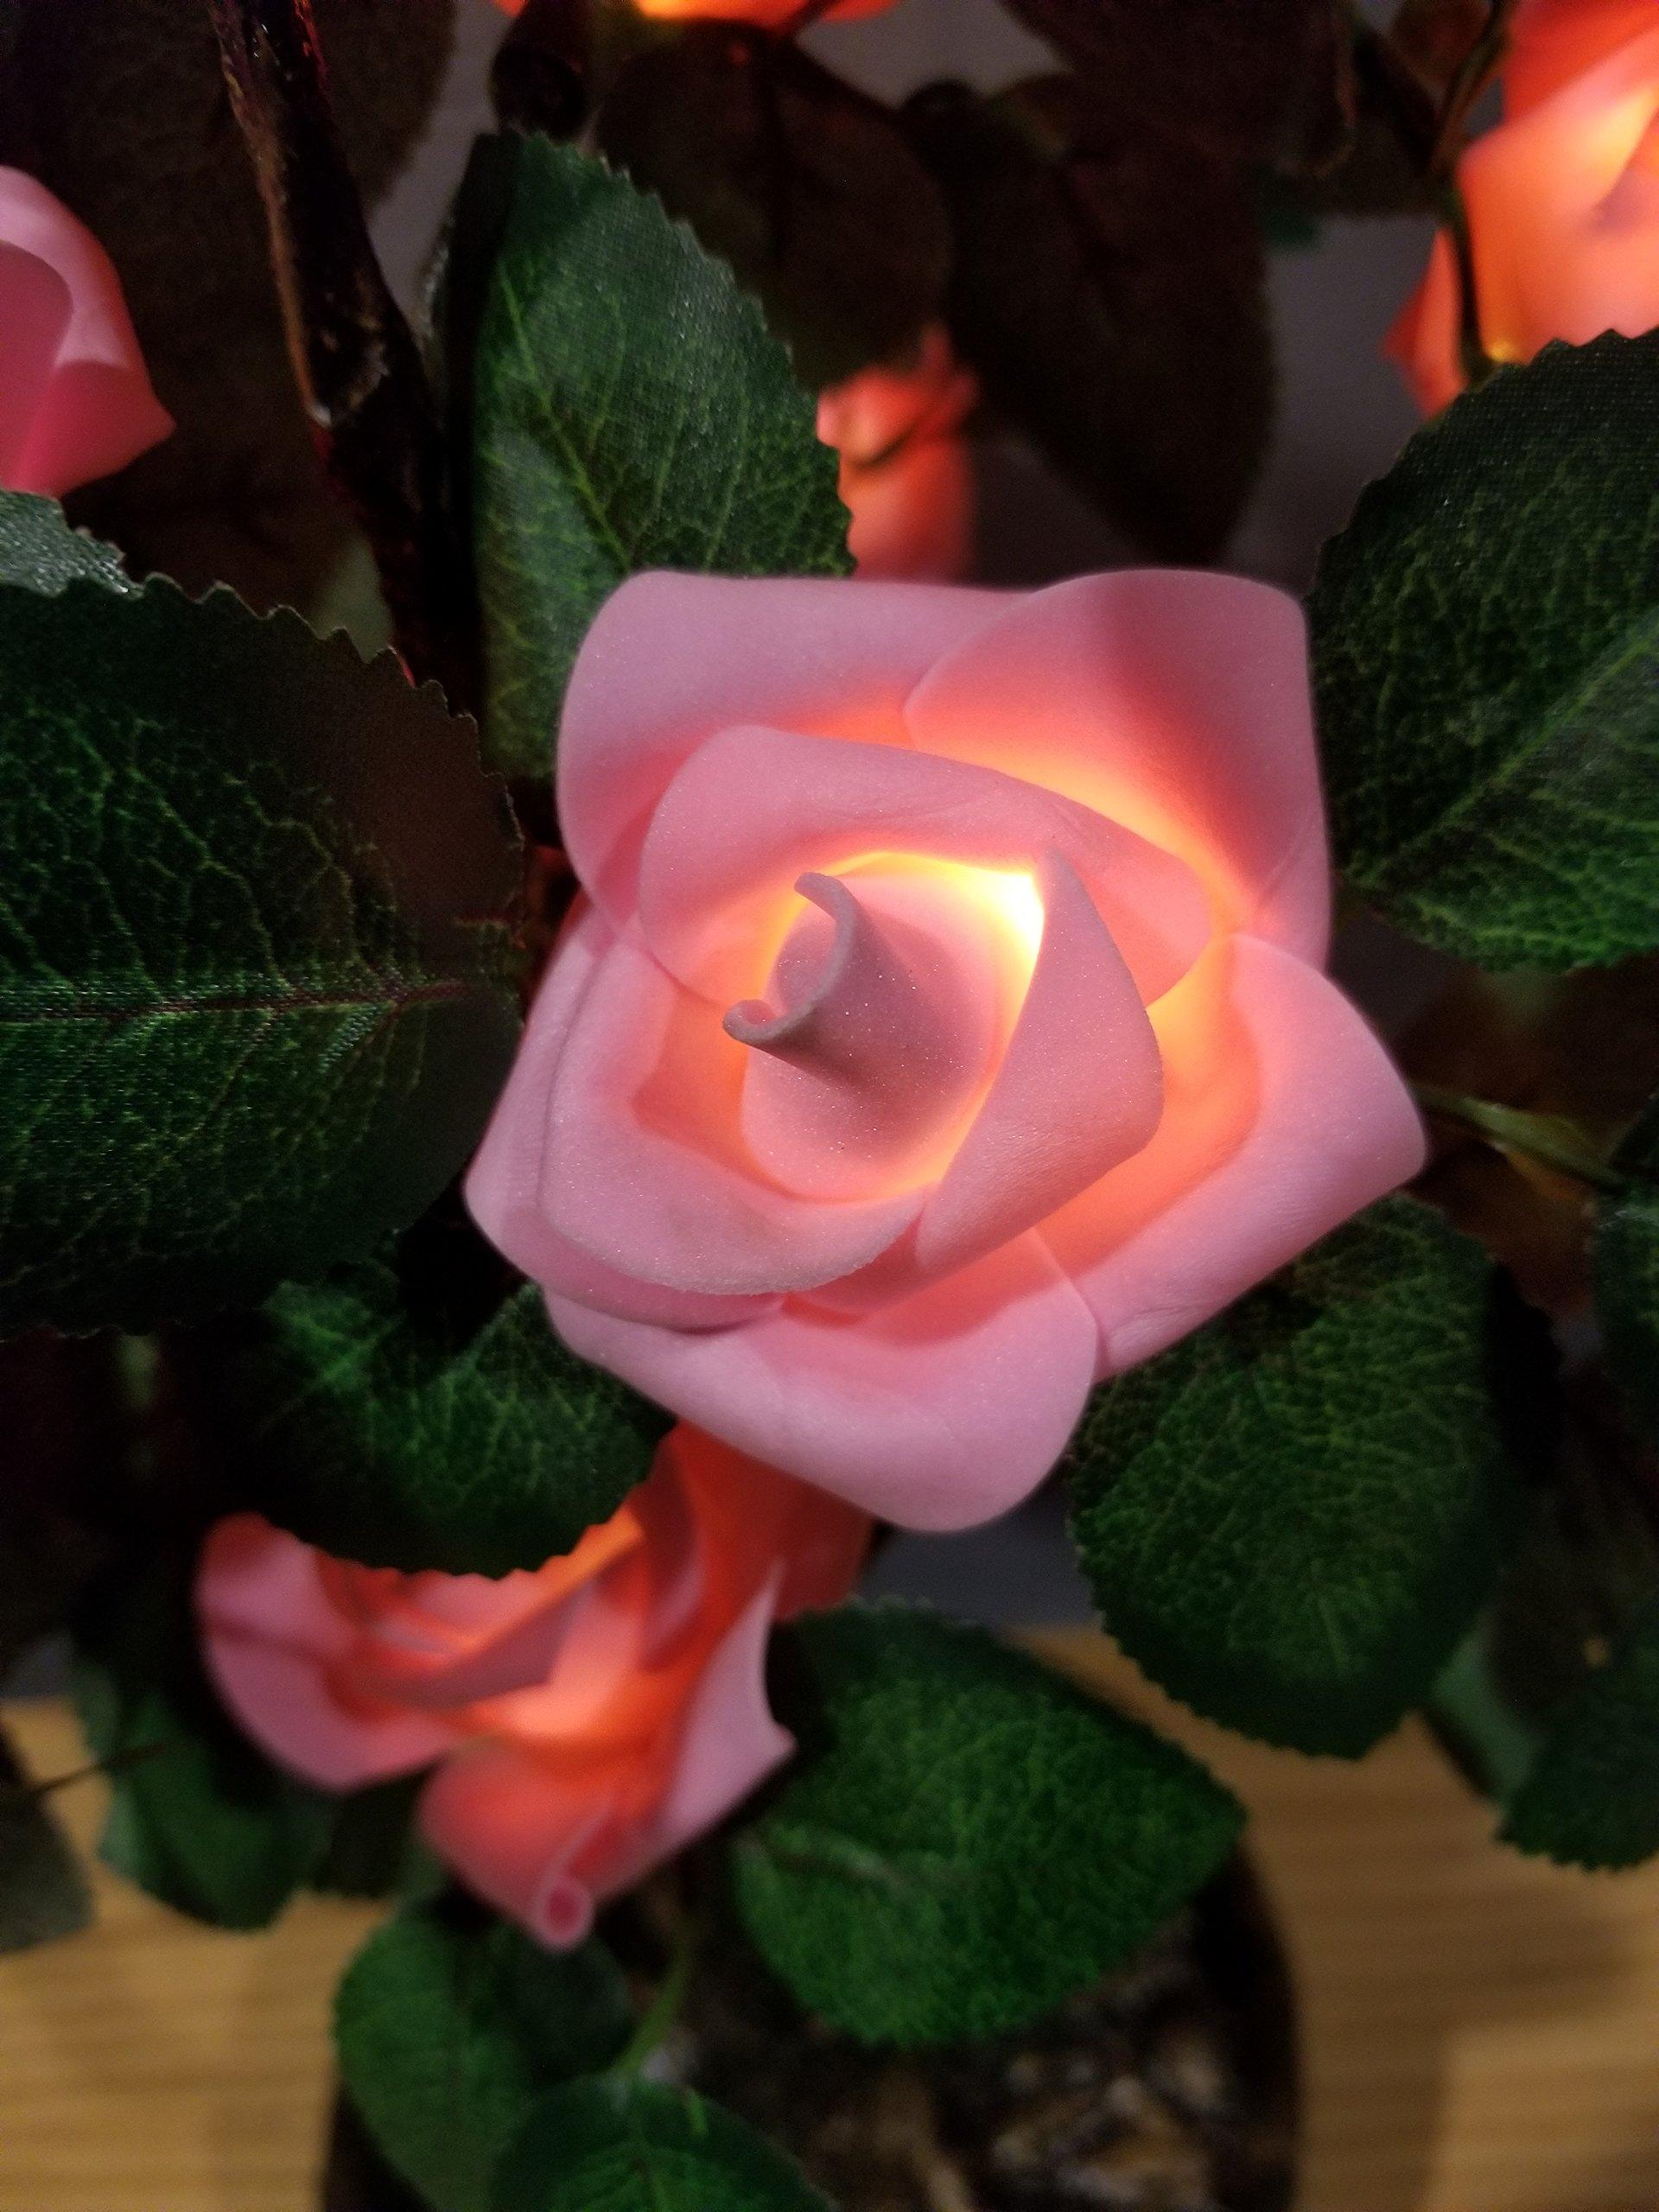 Bright Baum LED Light Artificial Bonsai Tree, 2.0-Feet,Pink Rose JUNO by Bright Baum